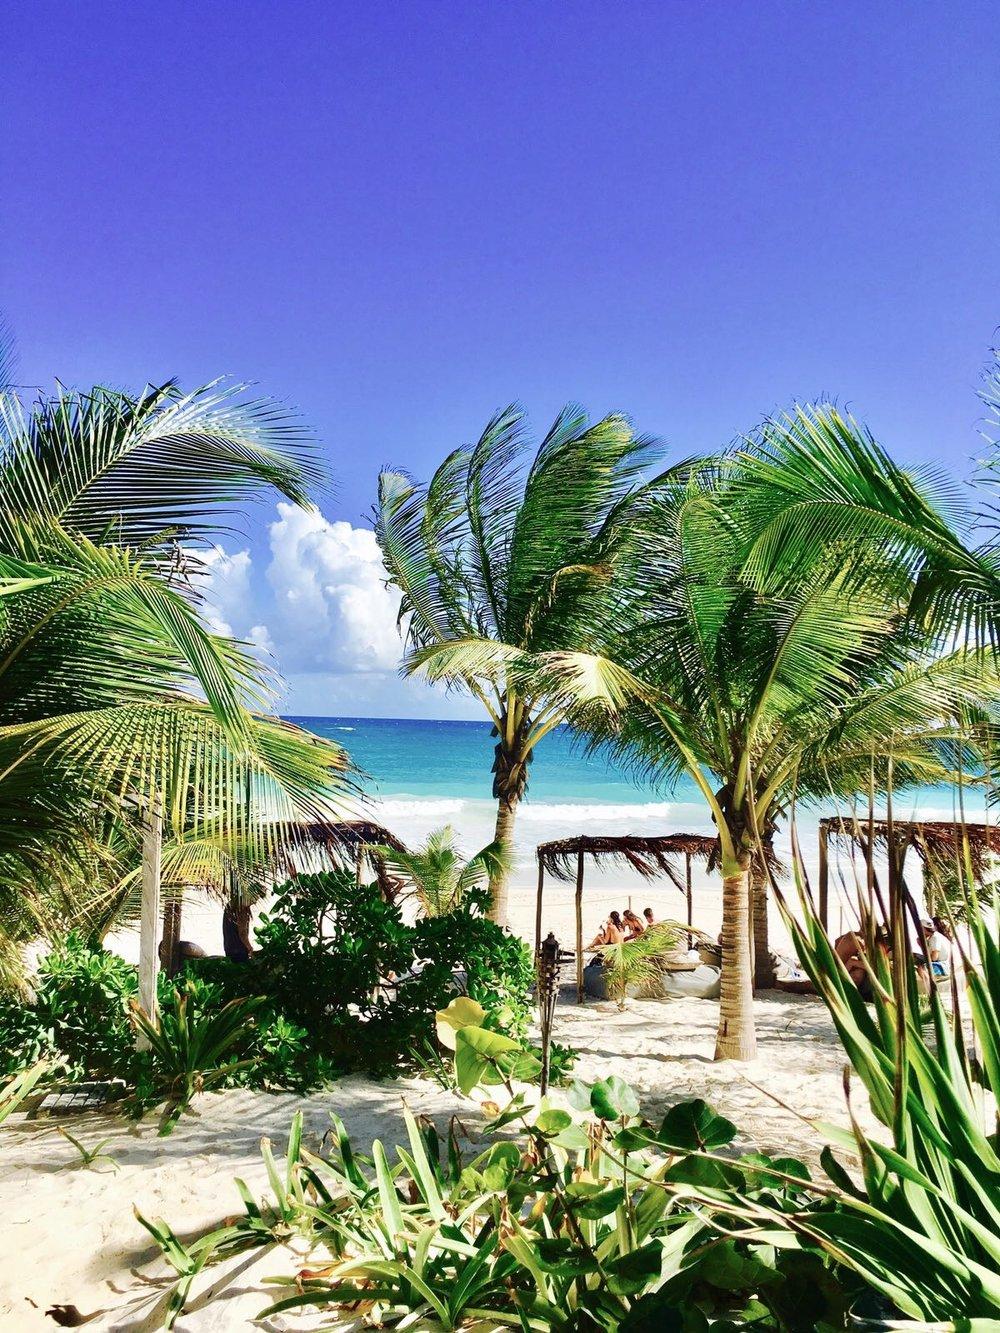 Andrea Emmerich, Tulum Beach cabanas, Yucatan Mexico - 3 Days*